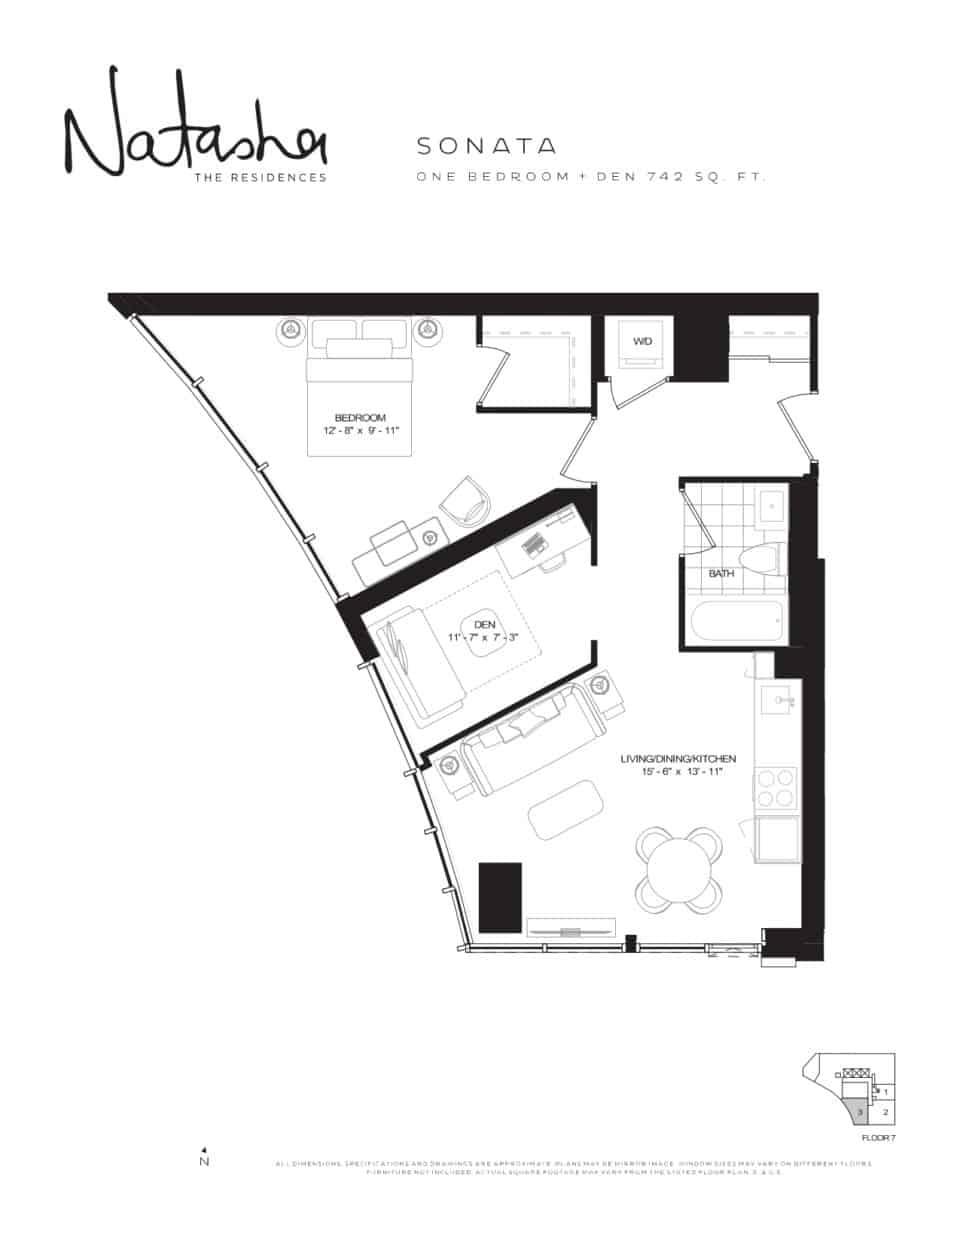 2021 09 02 11 03 16 natashatheresidences lanterradevelopments floorplans sonata